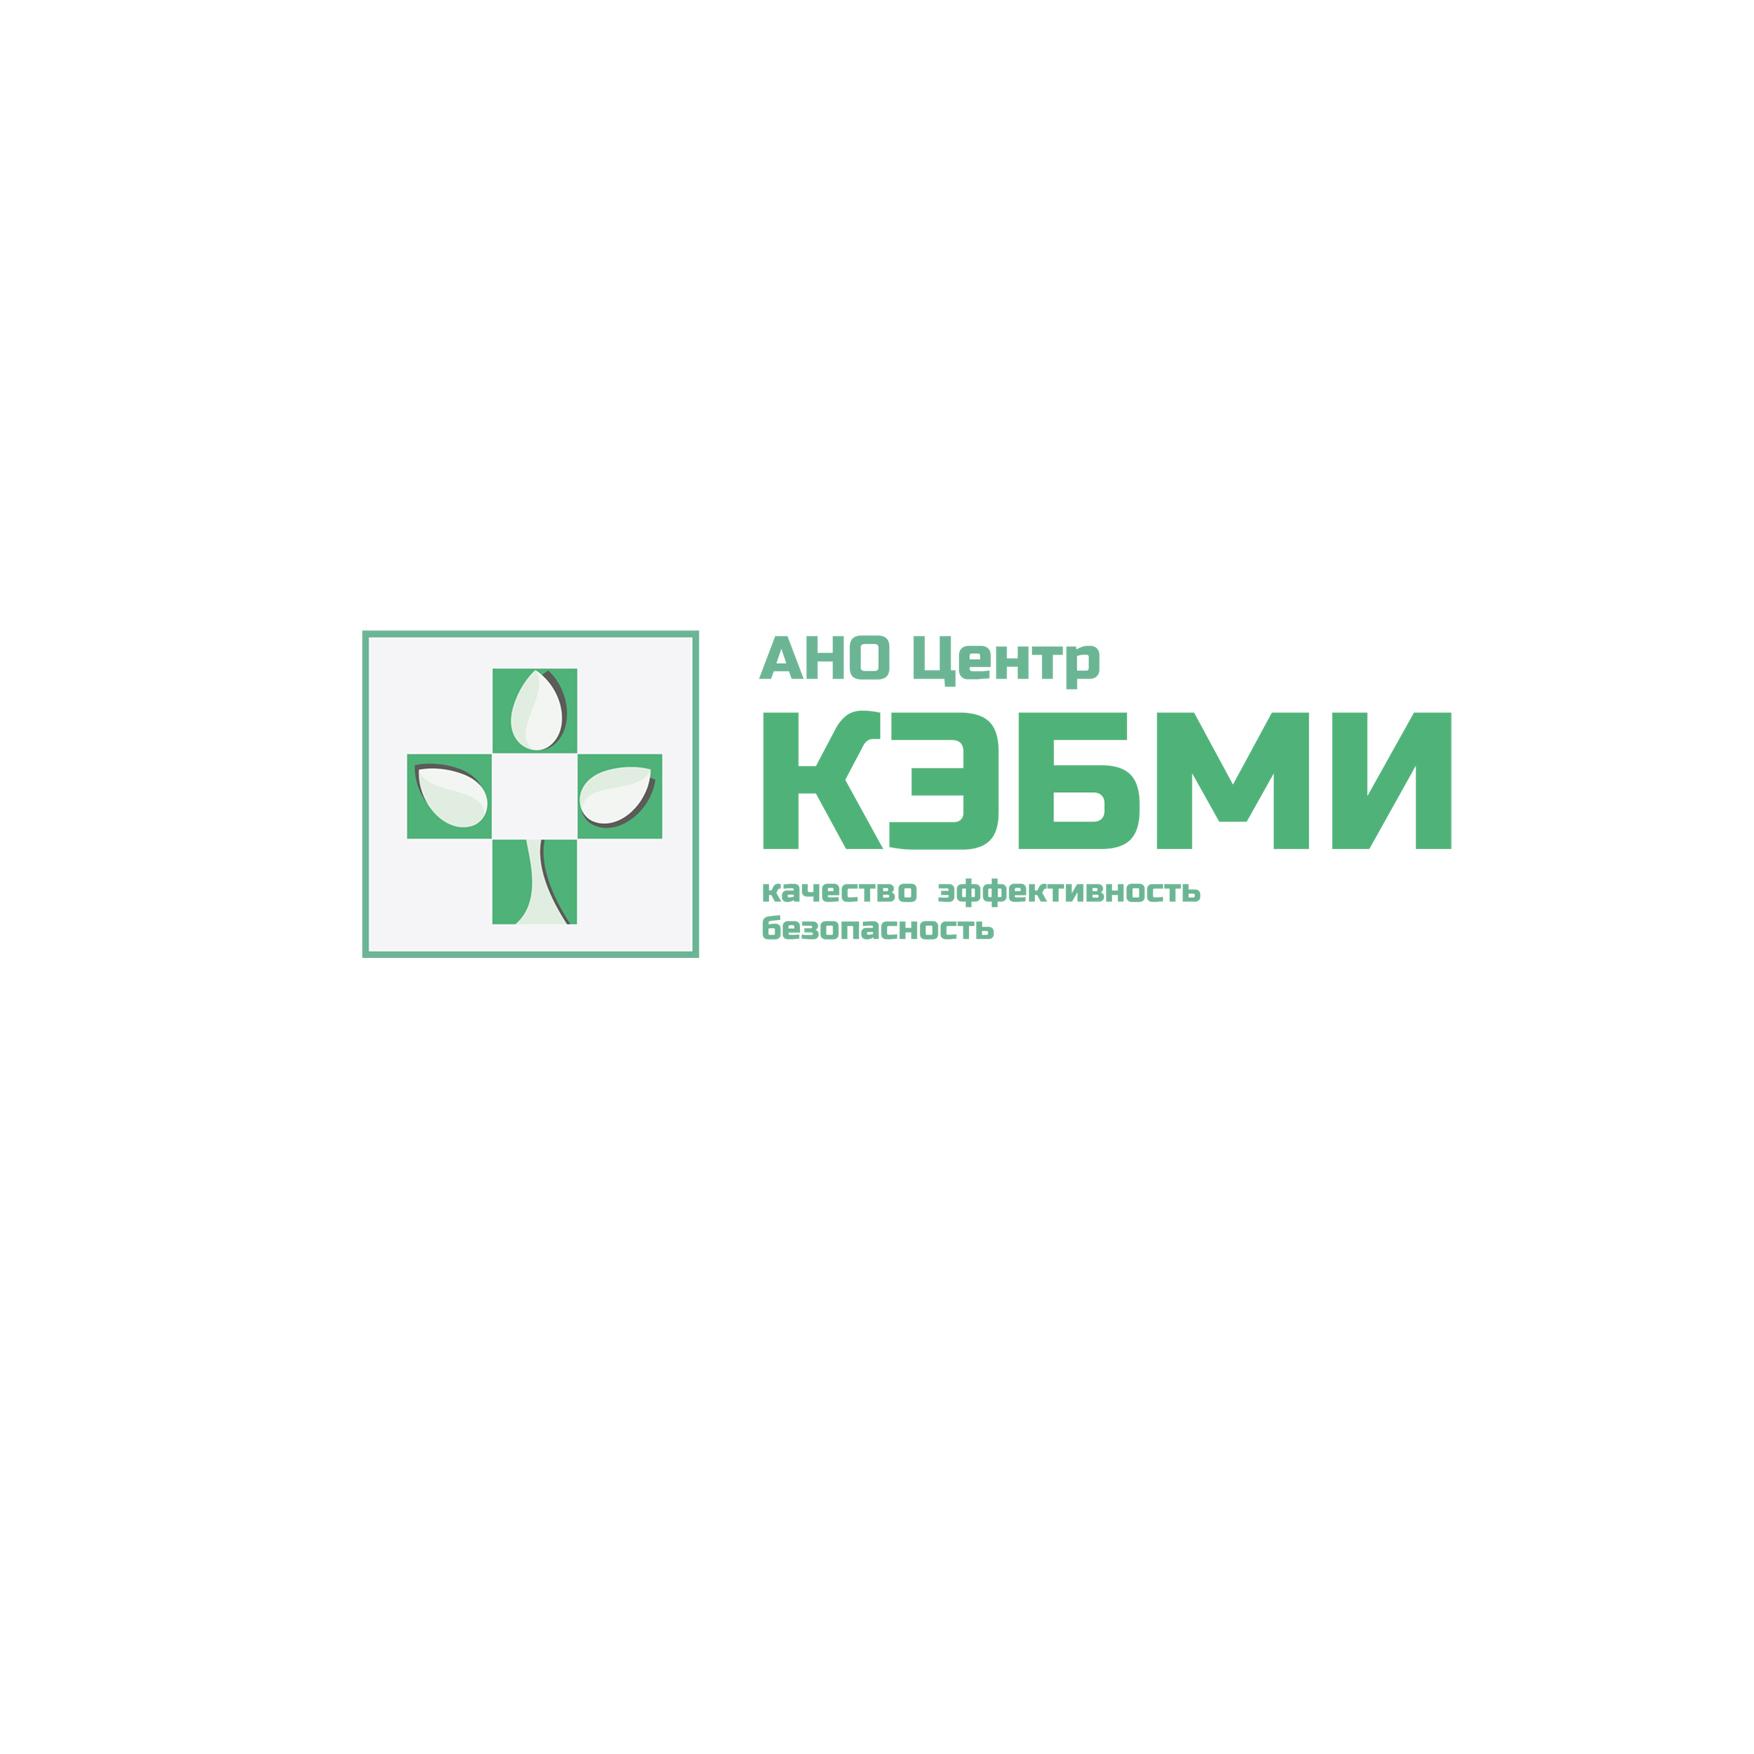 Редизайн логотипа АНО Центр КЭБМИ - BREVIS фото f_3245b29674f60c5c.jpg